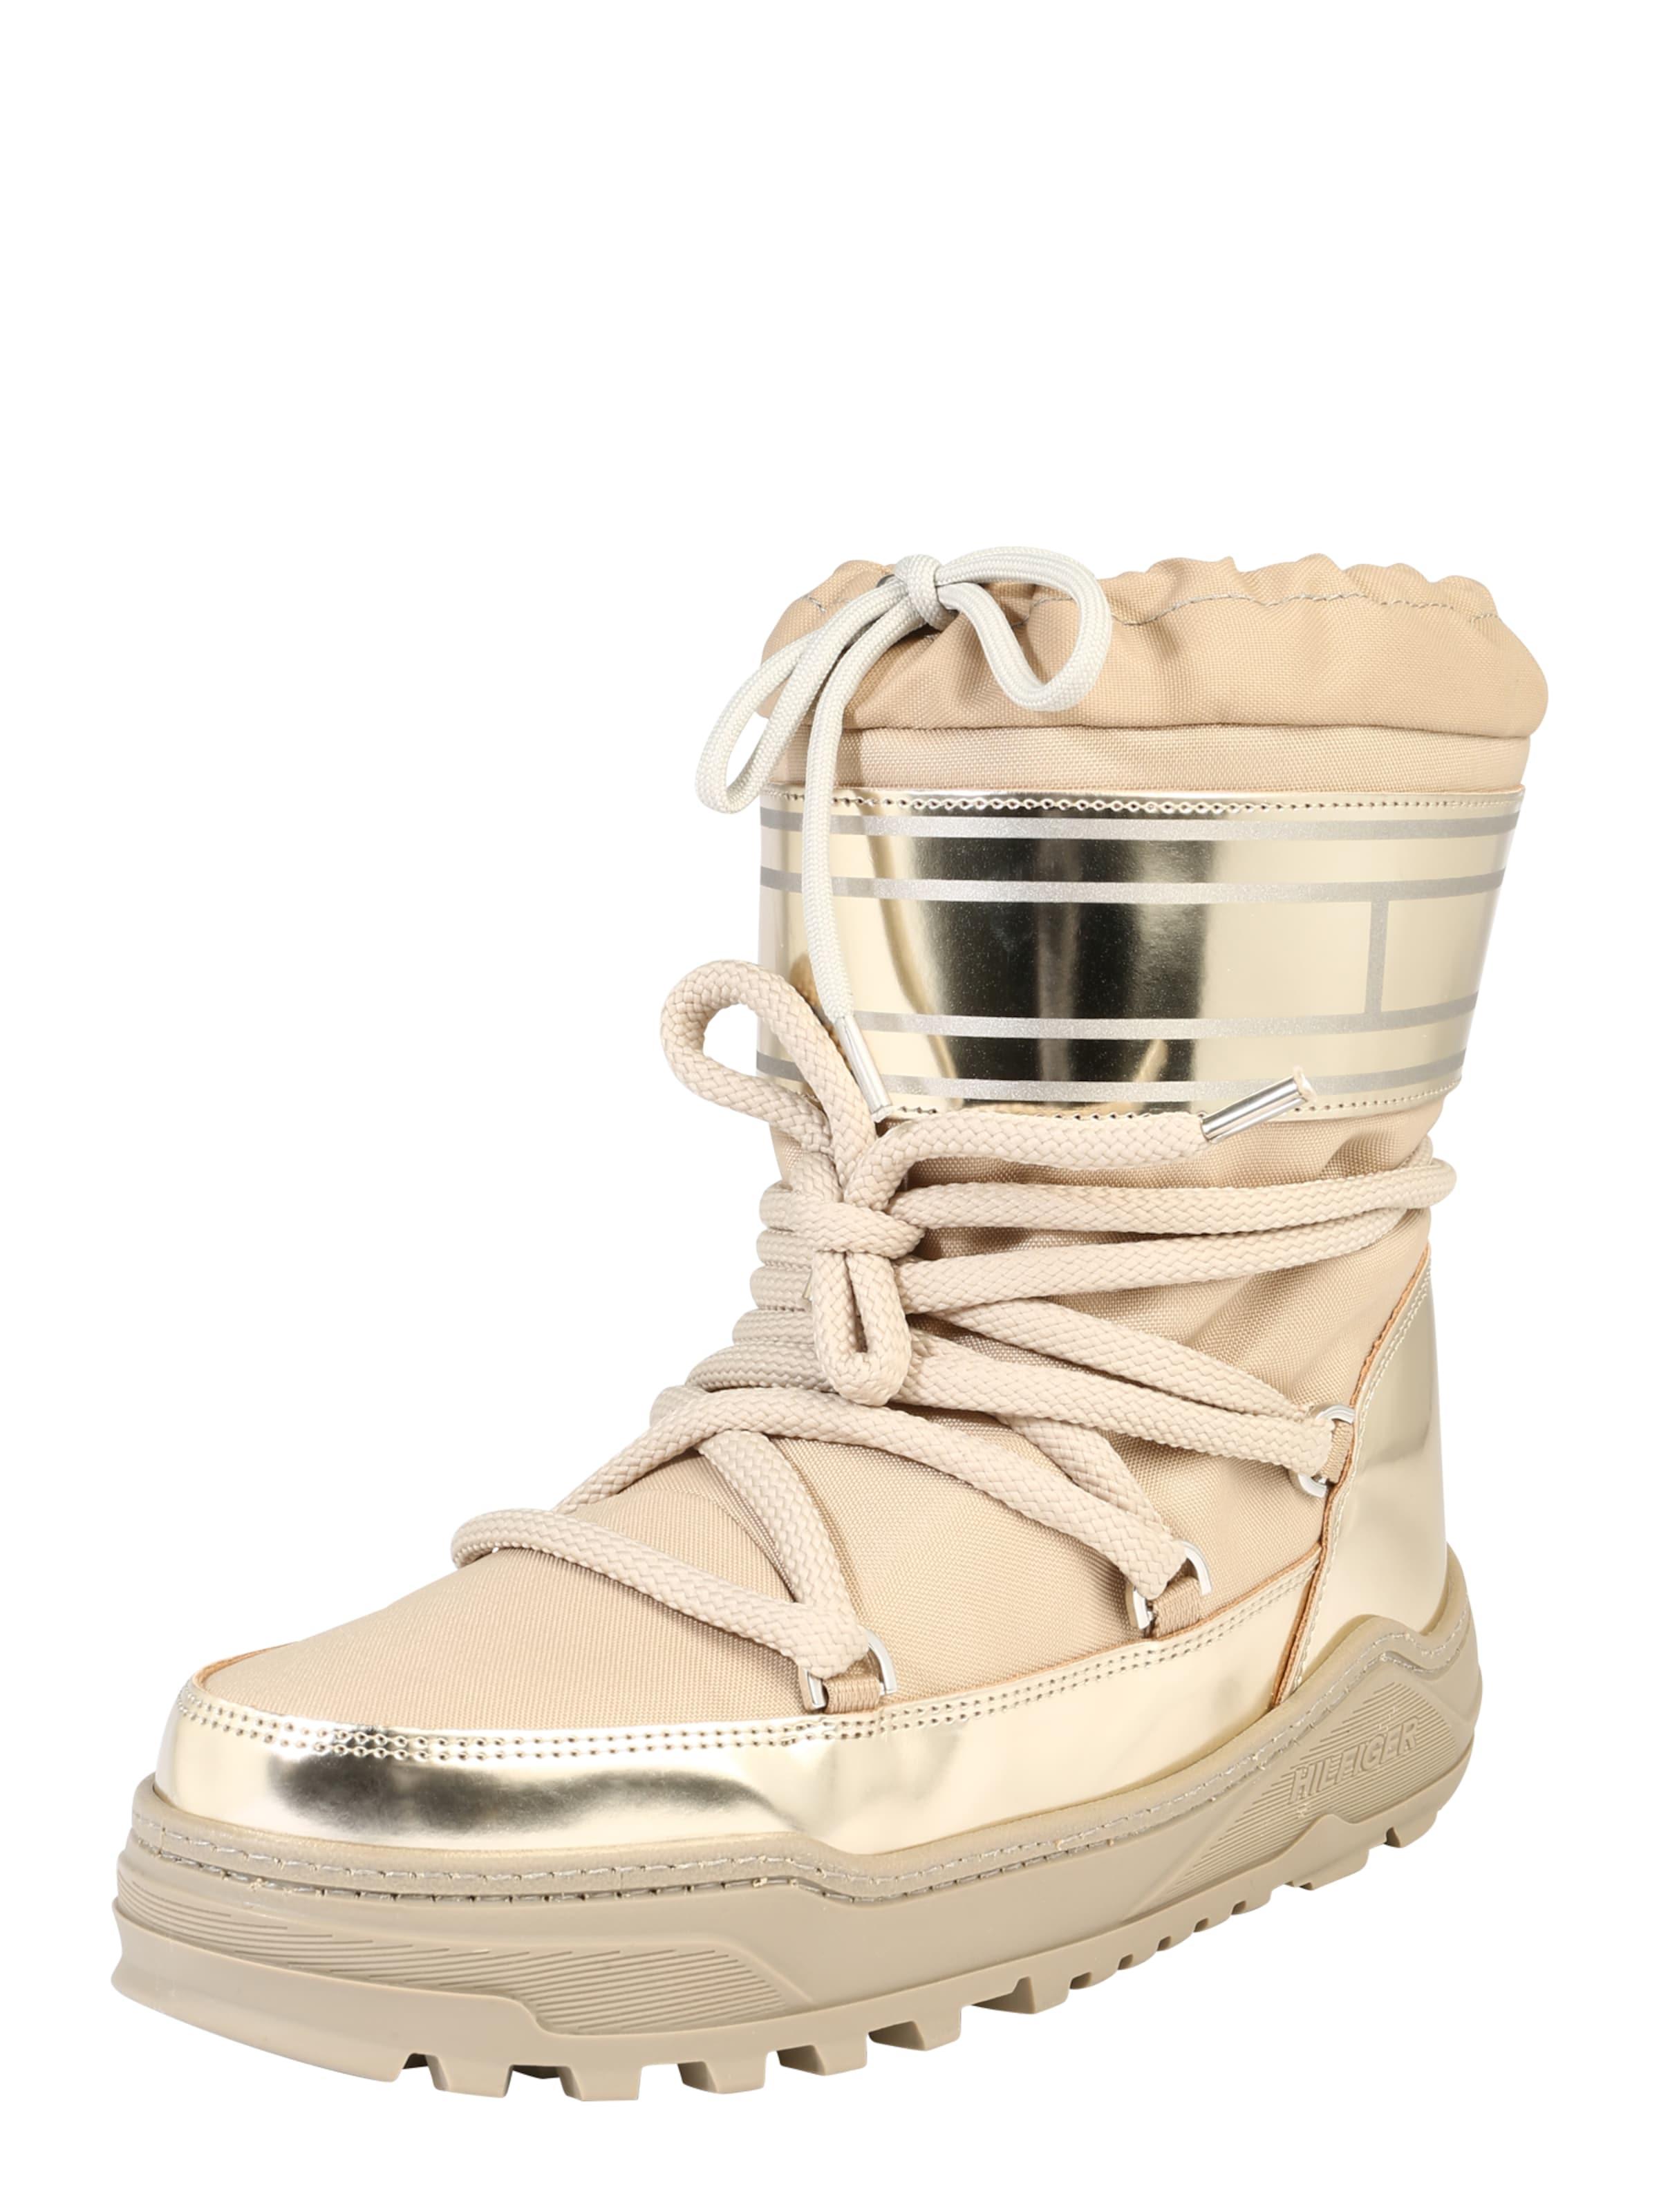 TOMMY im HILFIGER HILFIGER Glamour Snow Snow Boot TOMMY Look qBHgAf5w